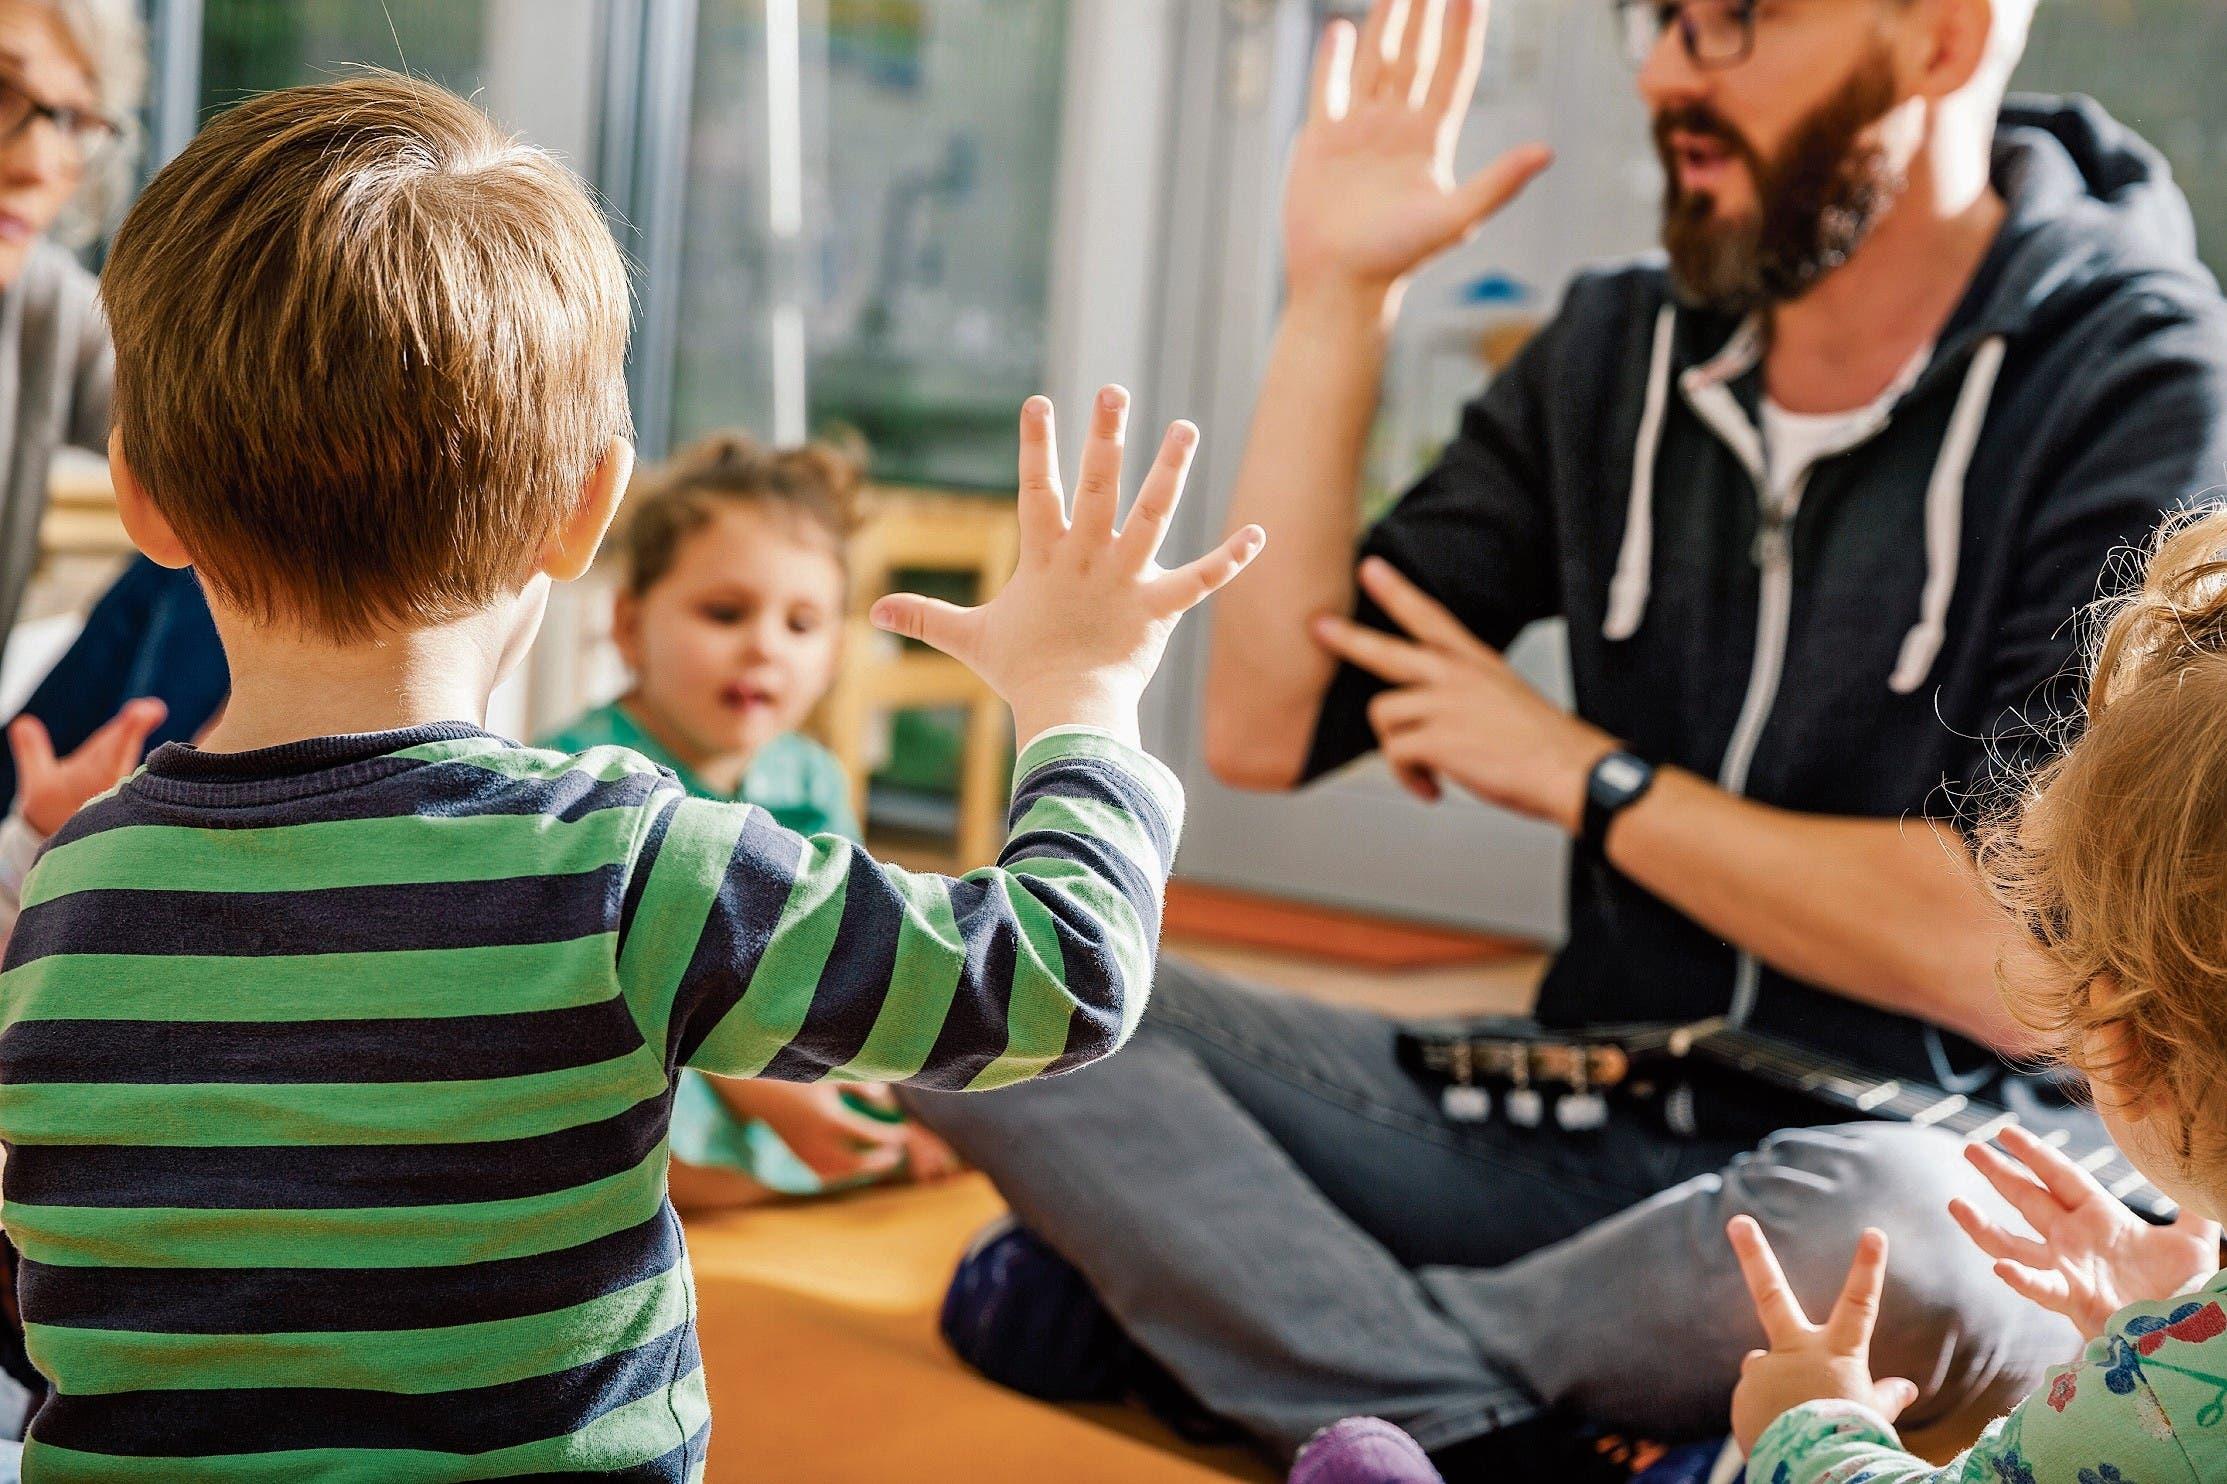 Doktorspiele unter kindern geschichten